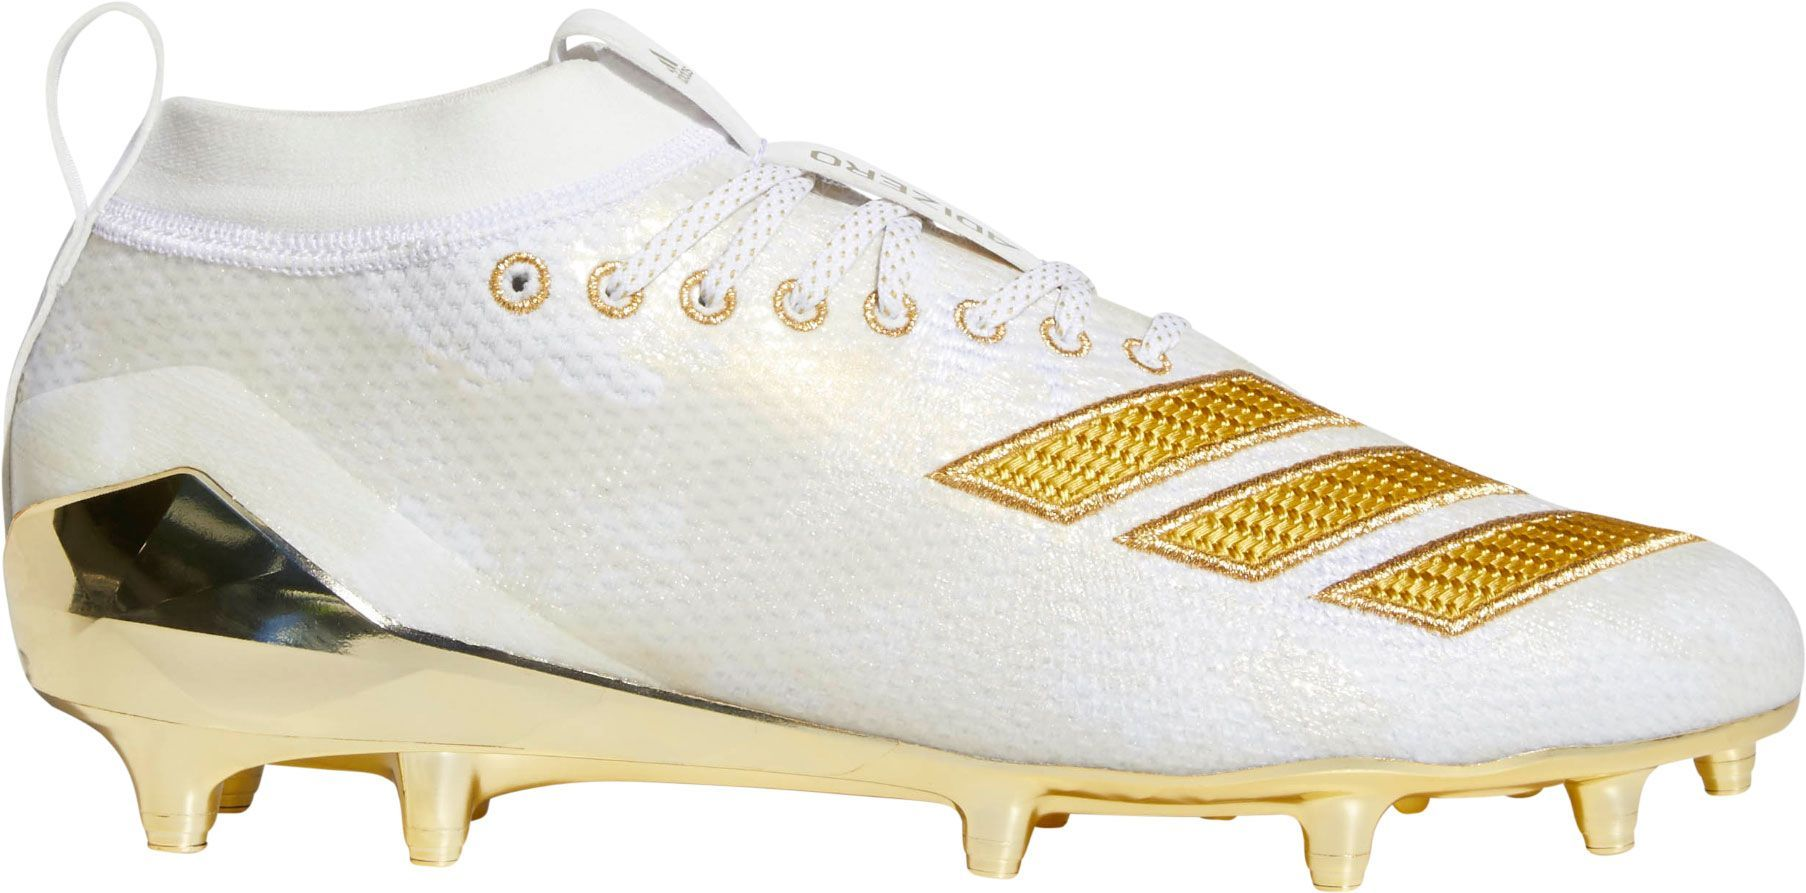 Football cleats, Cleats, Adidas men